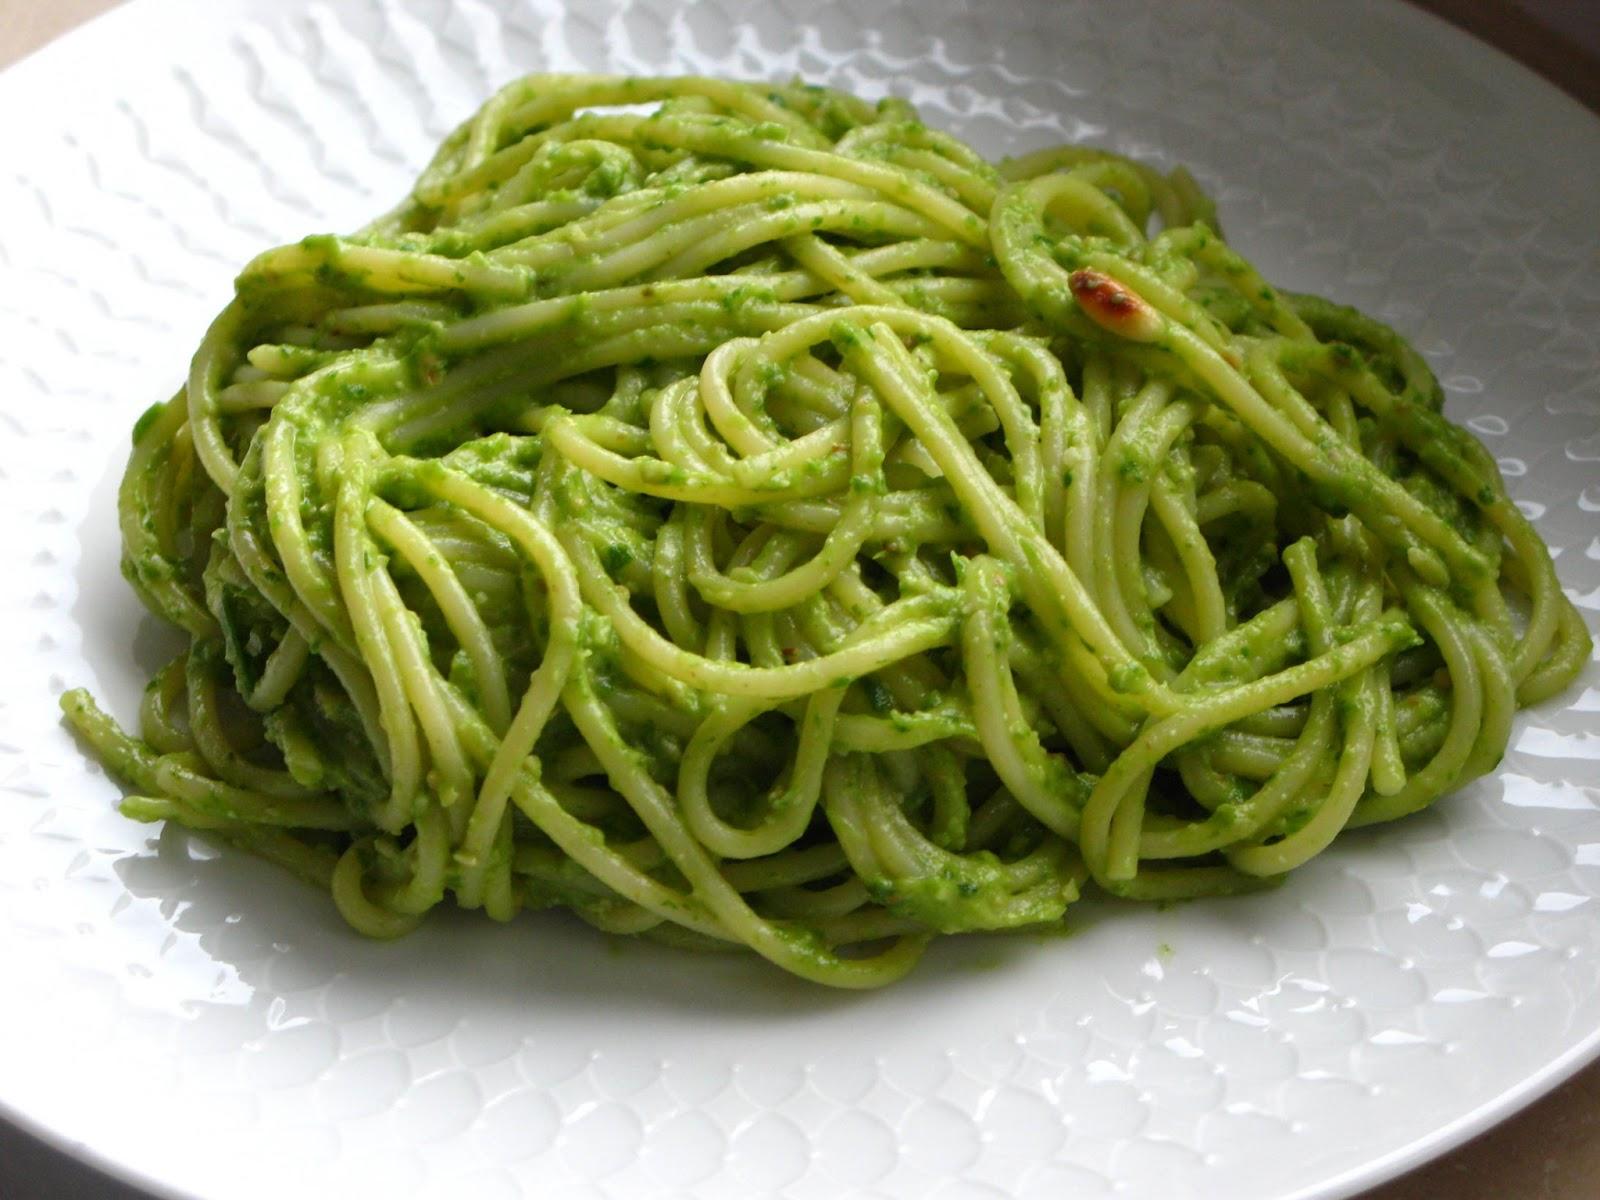 gourmandises v g tariennes spaghetti mit veganem avocado postelein pesto. Black Bedroom Furniture Sets. Home Design Ideas